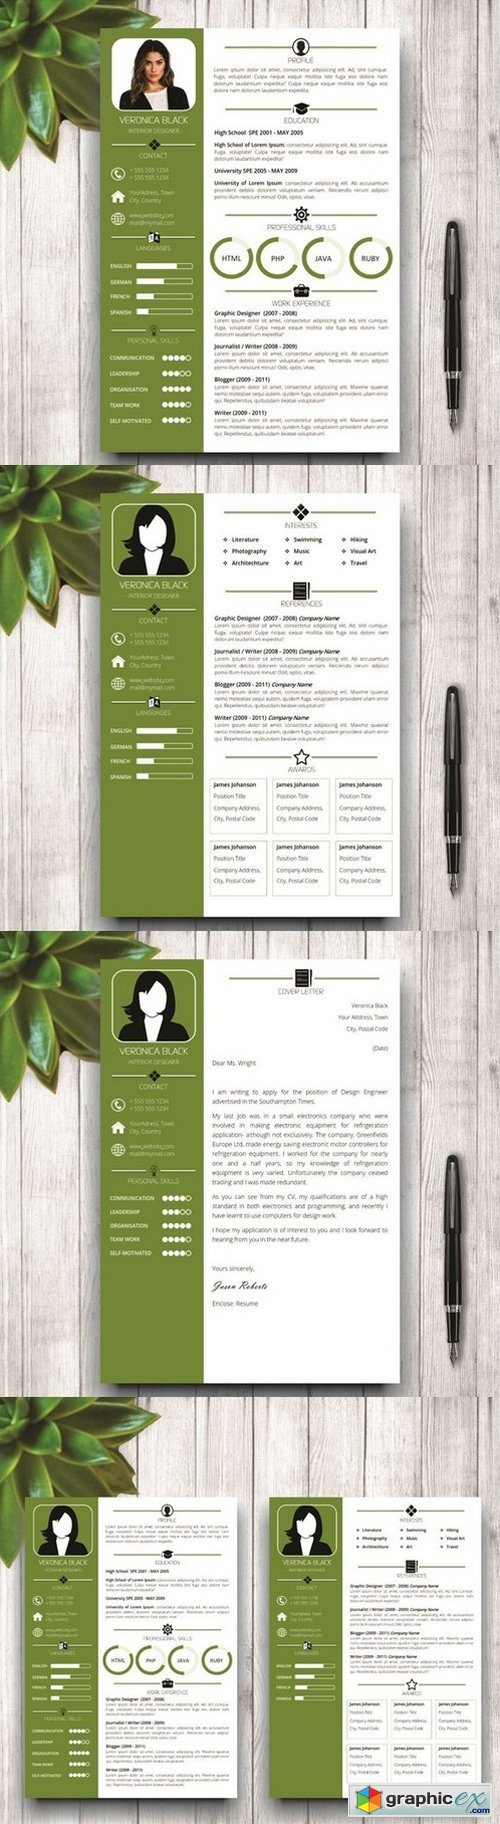 resume and cv  u00bb page 20  u00bb free download vector stock image